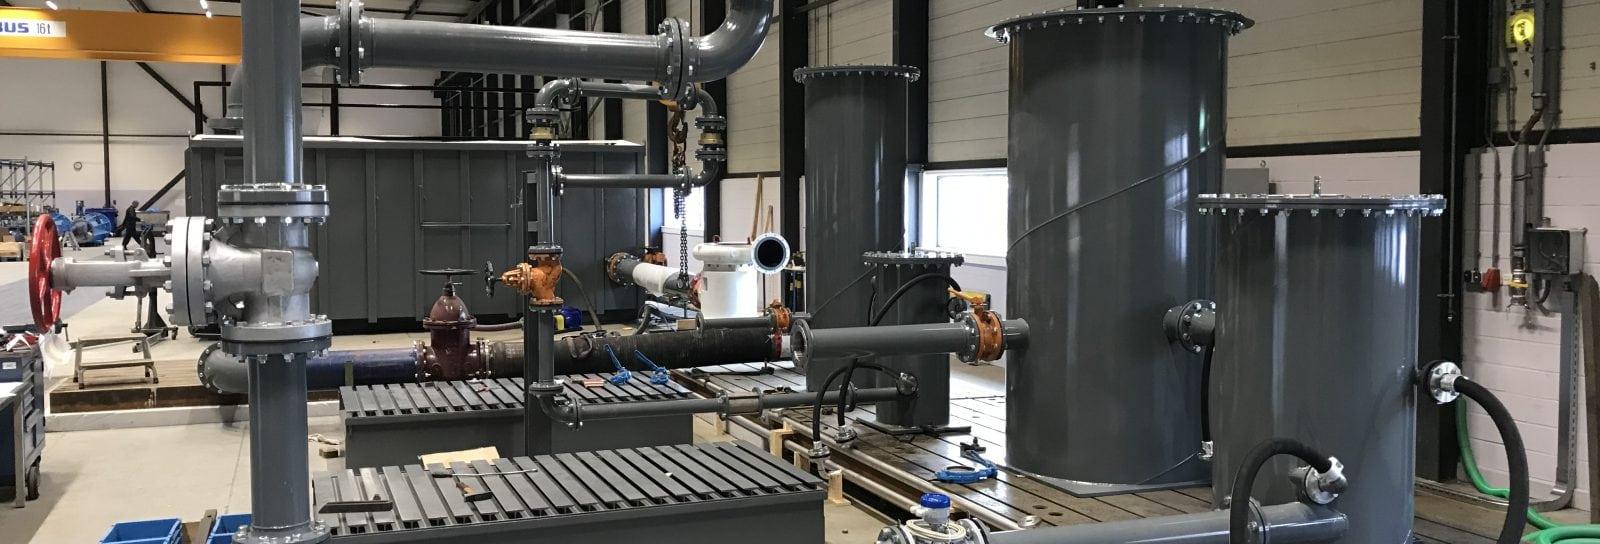 Test lab for API pumps